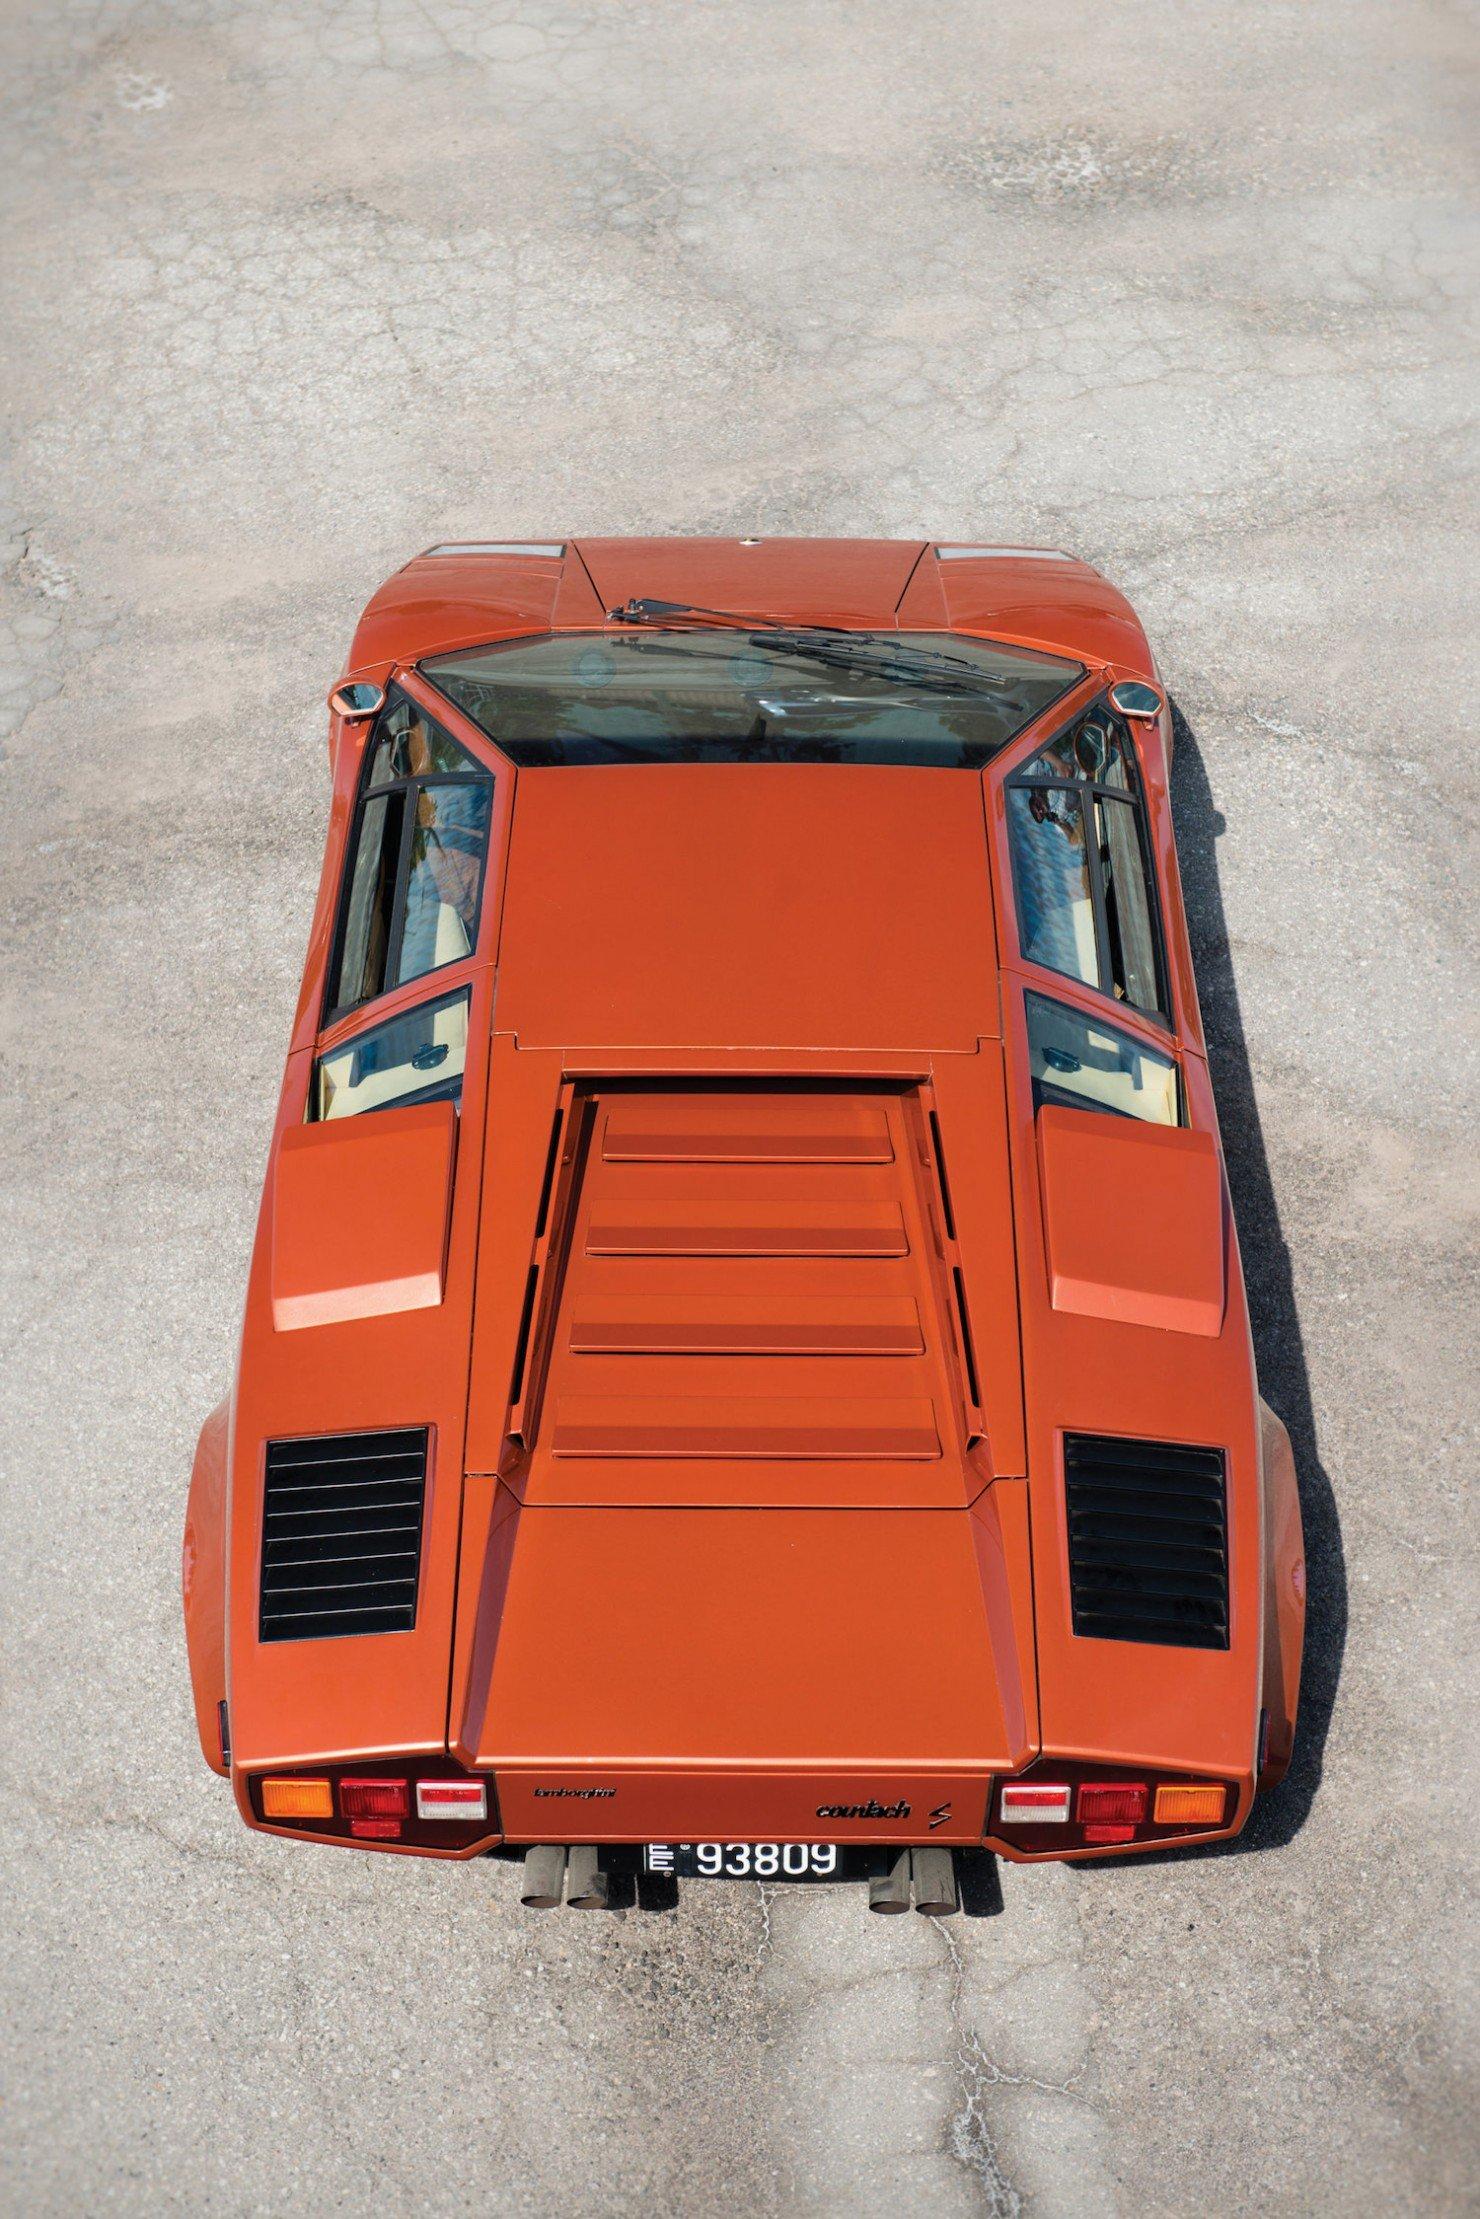 Lamborghini_Countach_LP400S_13